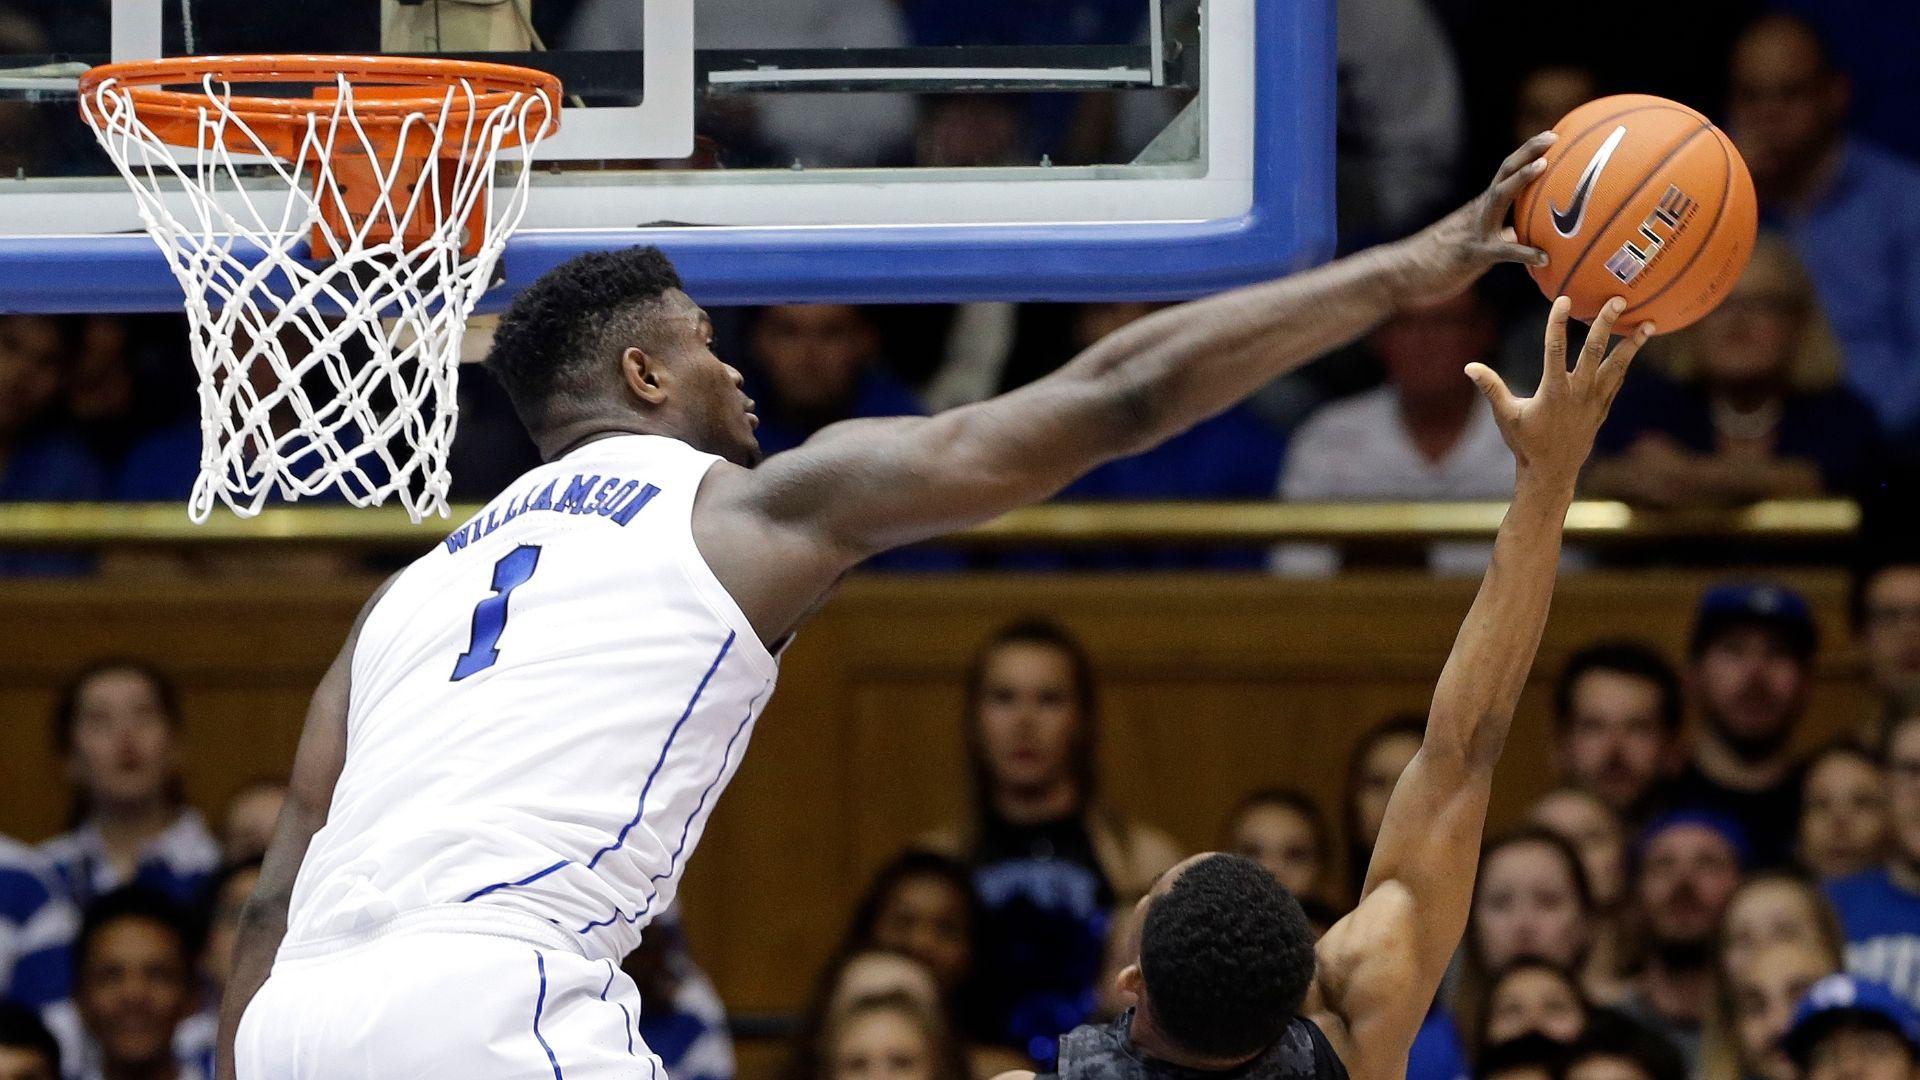 Zion shows off athleticism in Duke win - ESPN Video